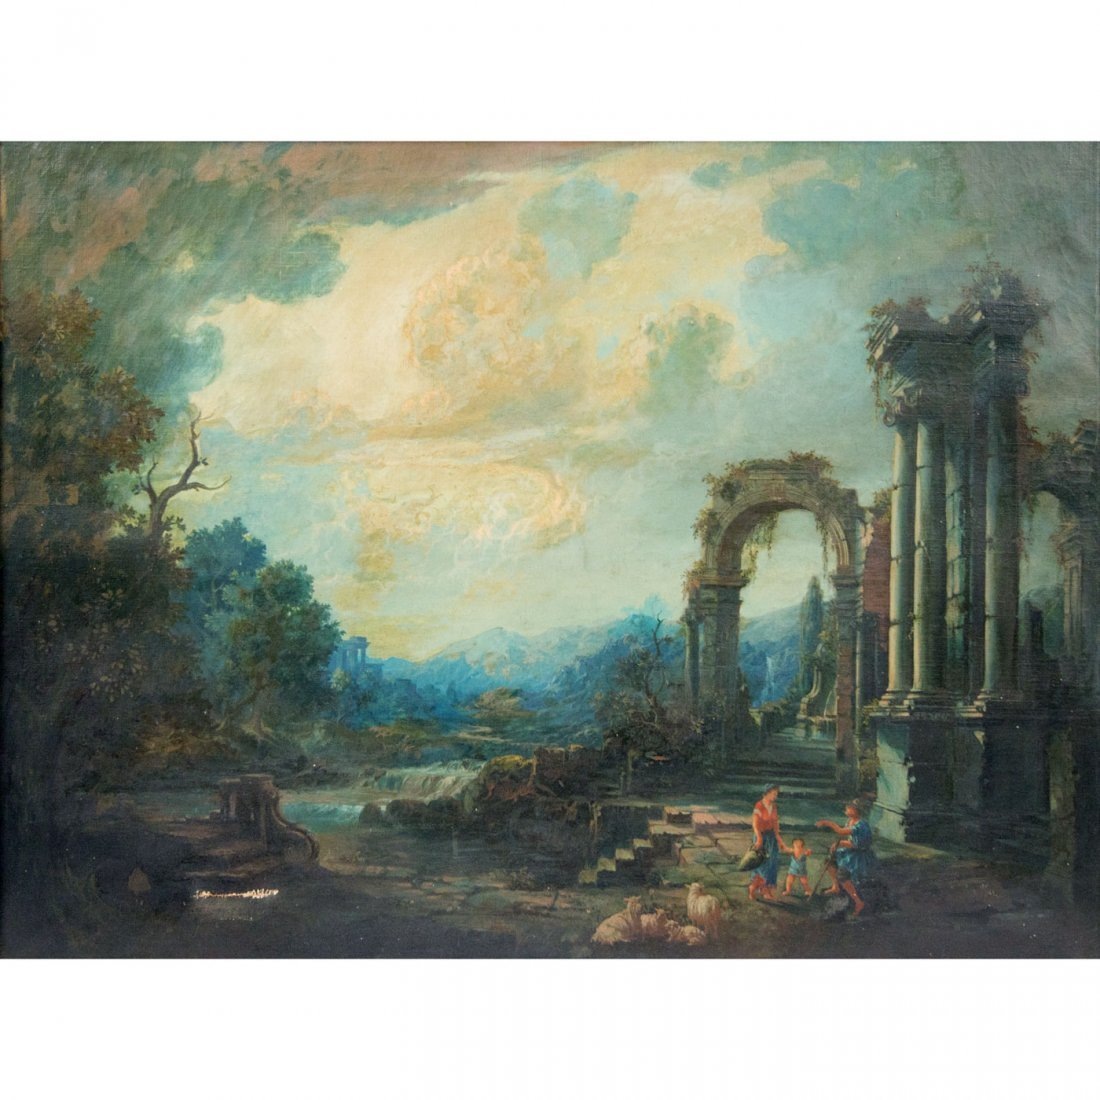 6: Italian School, 18th Century